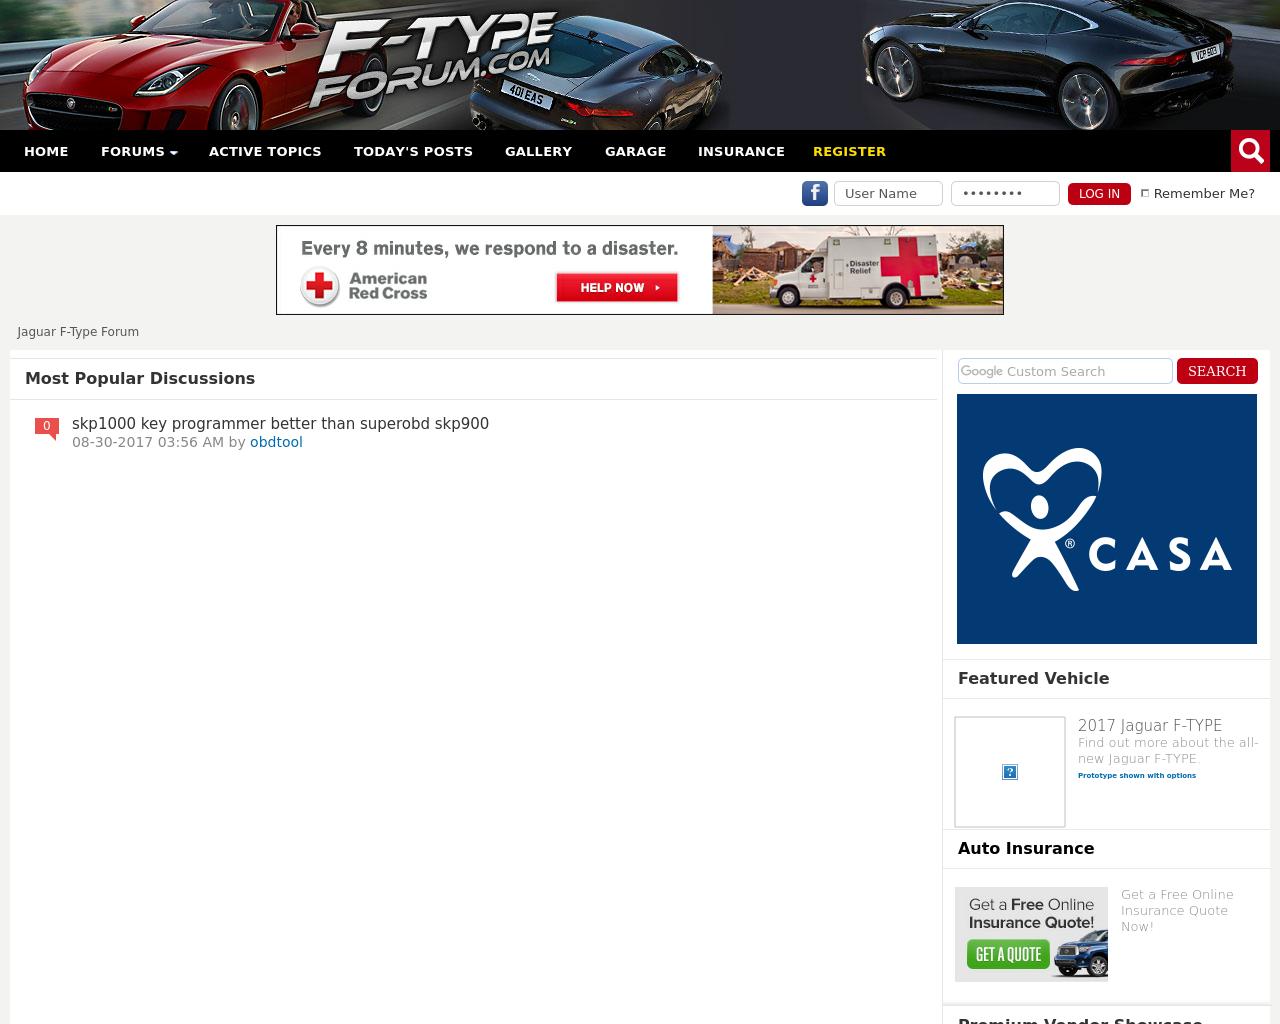 Jaguar-F-Type-Forum-Advertising-Reviews-Pricing